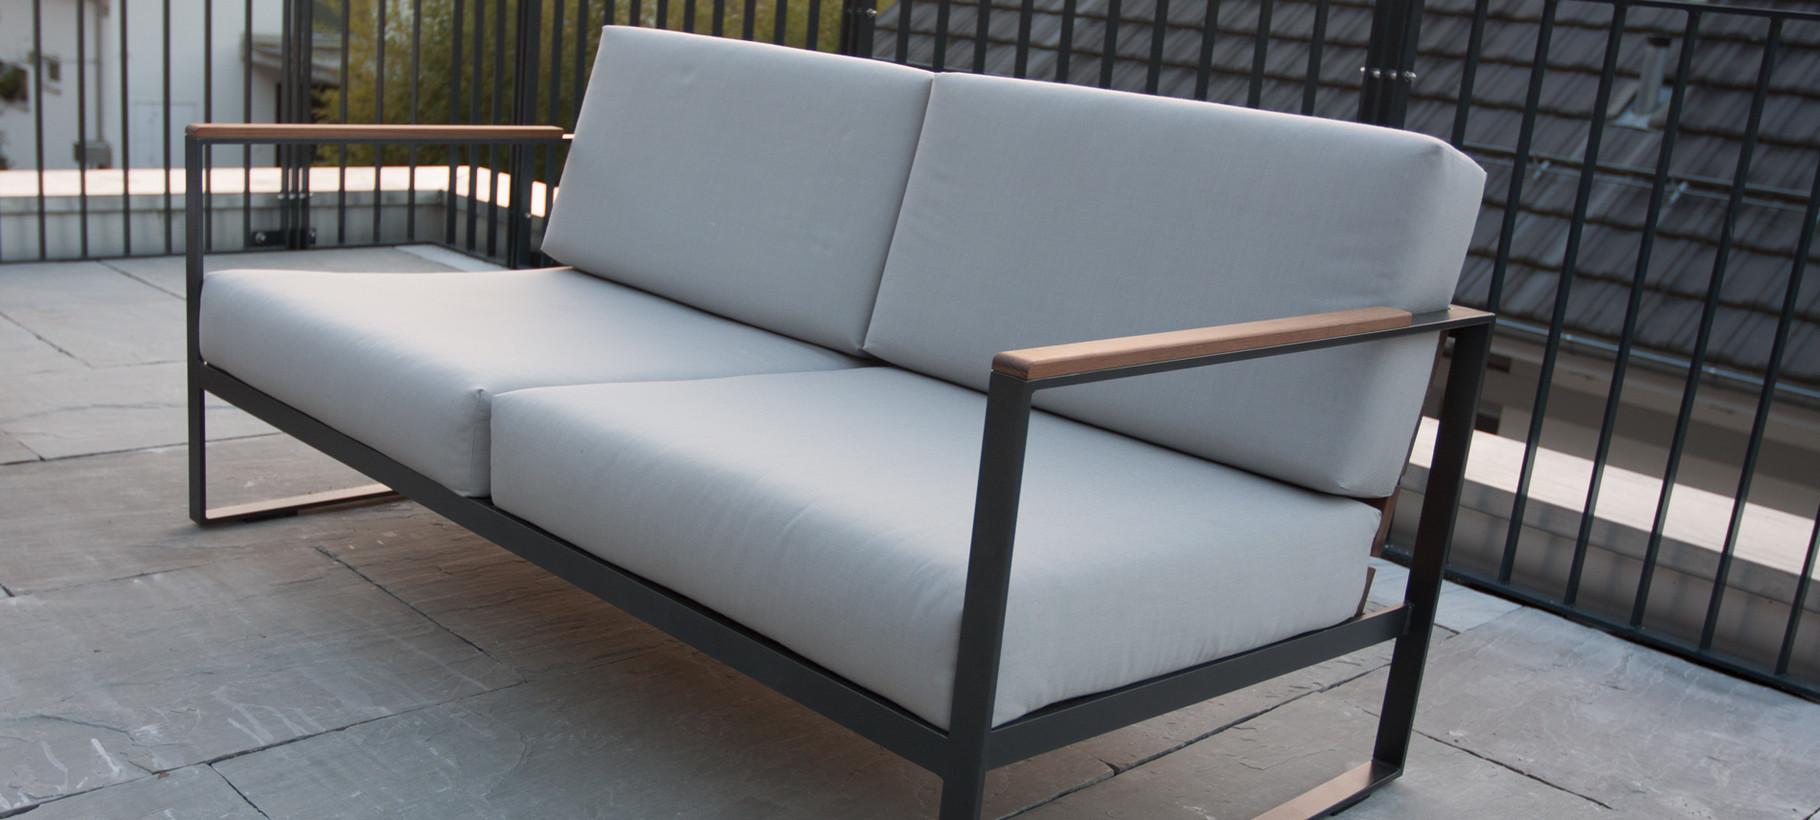 Design metall lounge gartenm bel gartenlounge schweiz for Garten lounge design